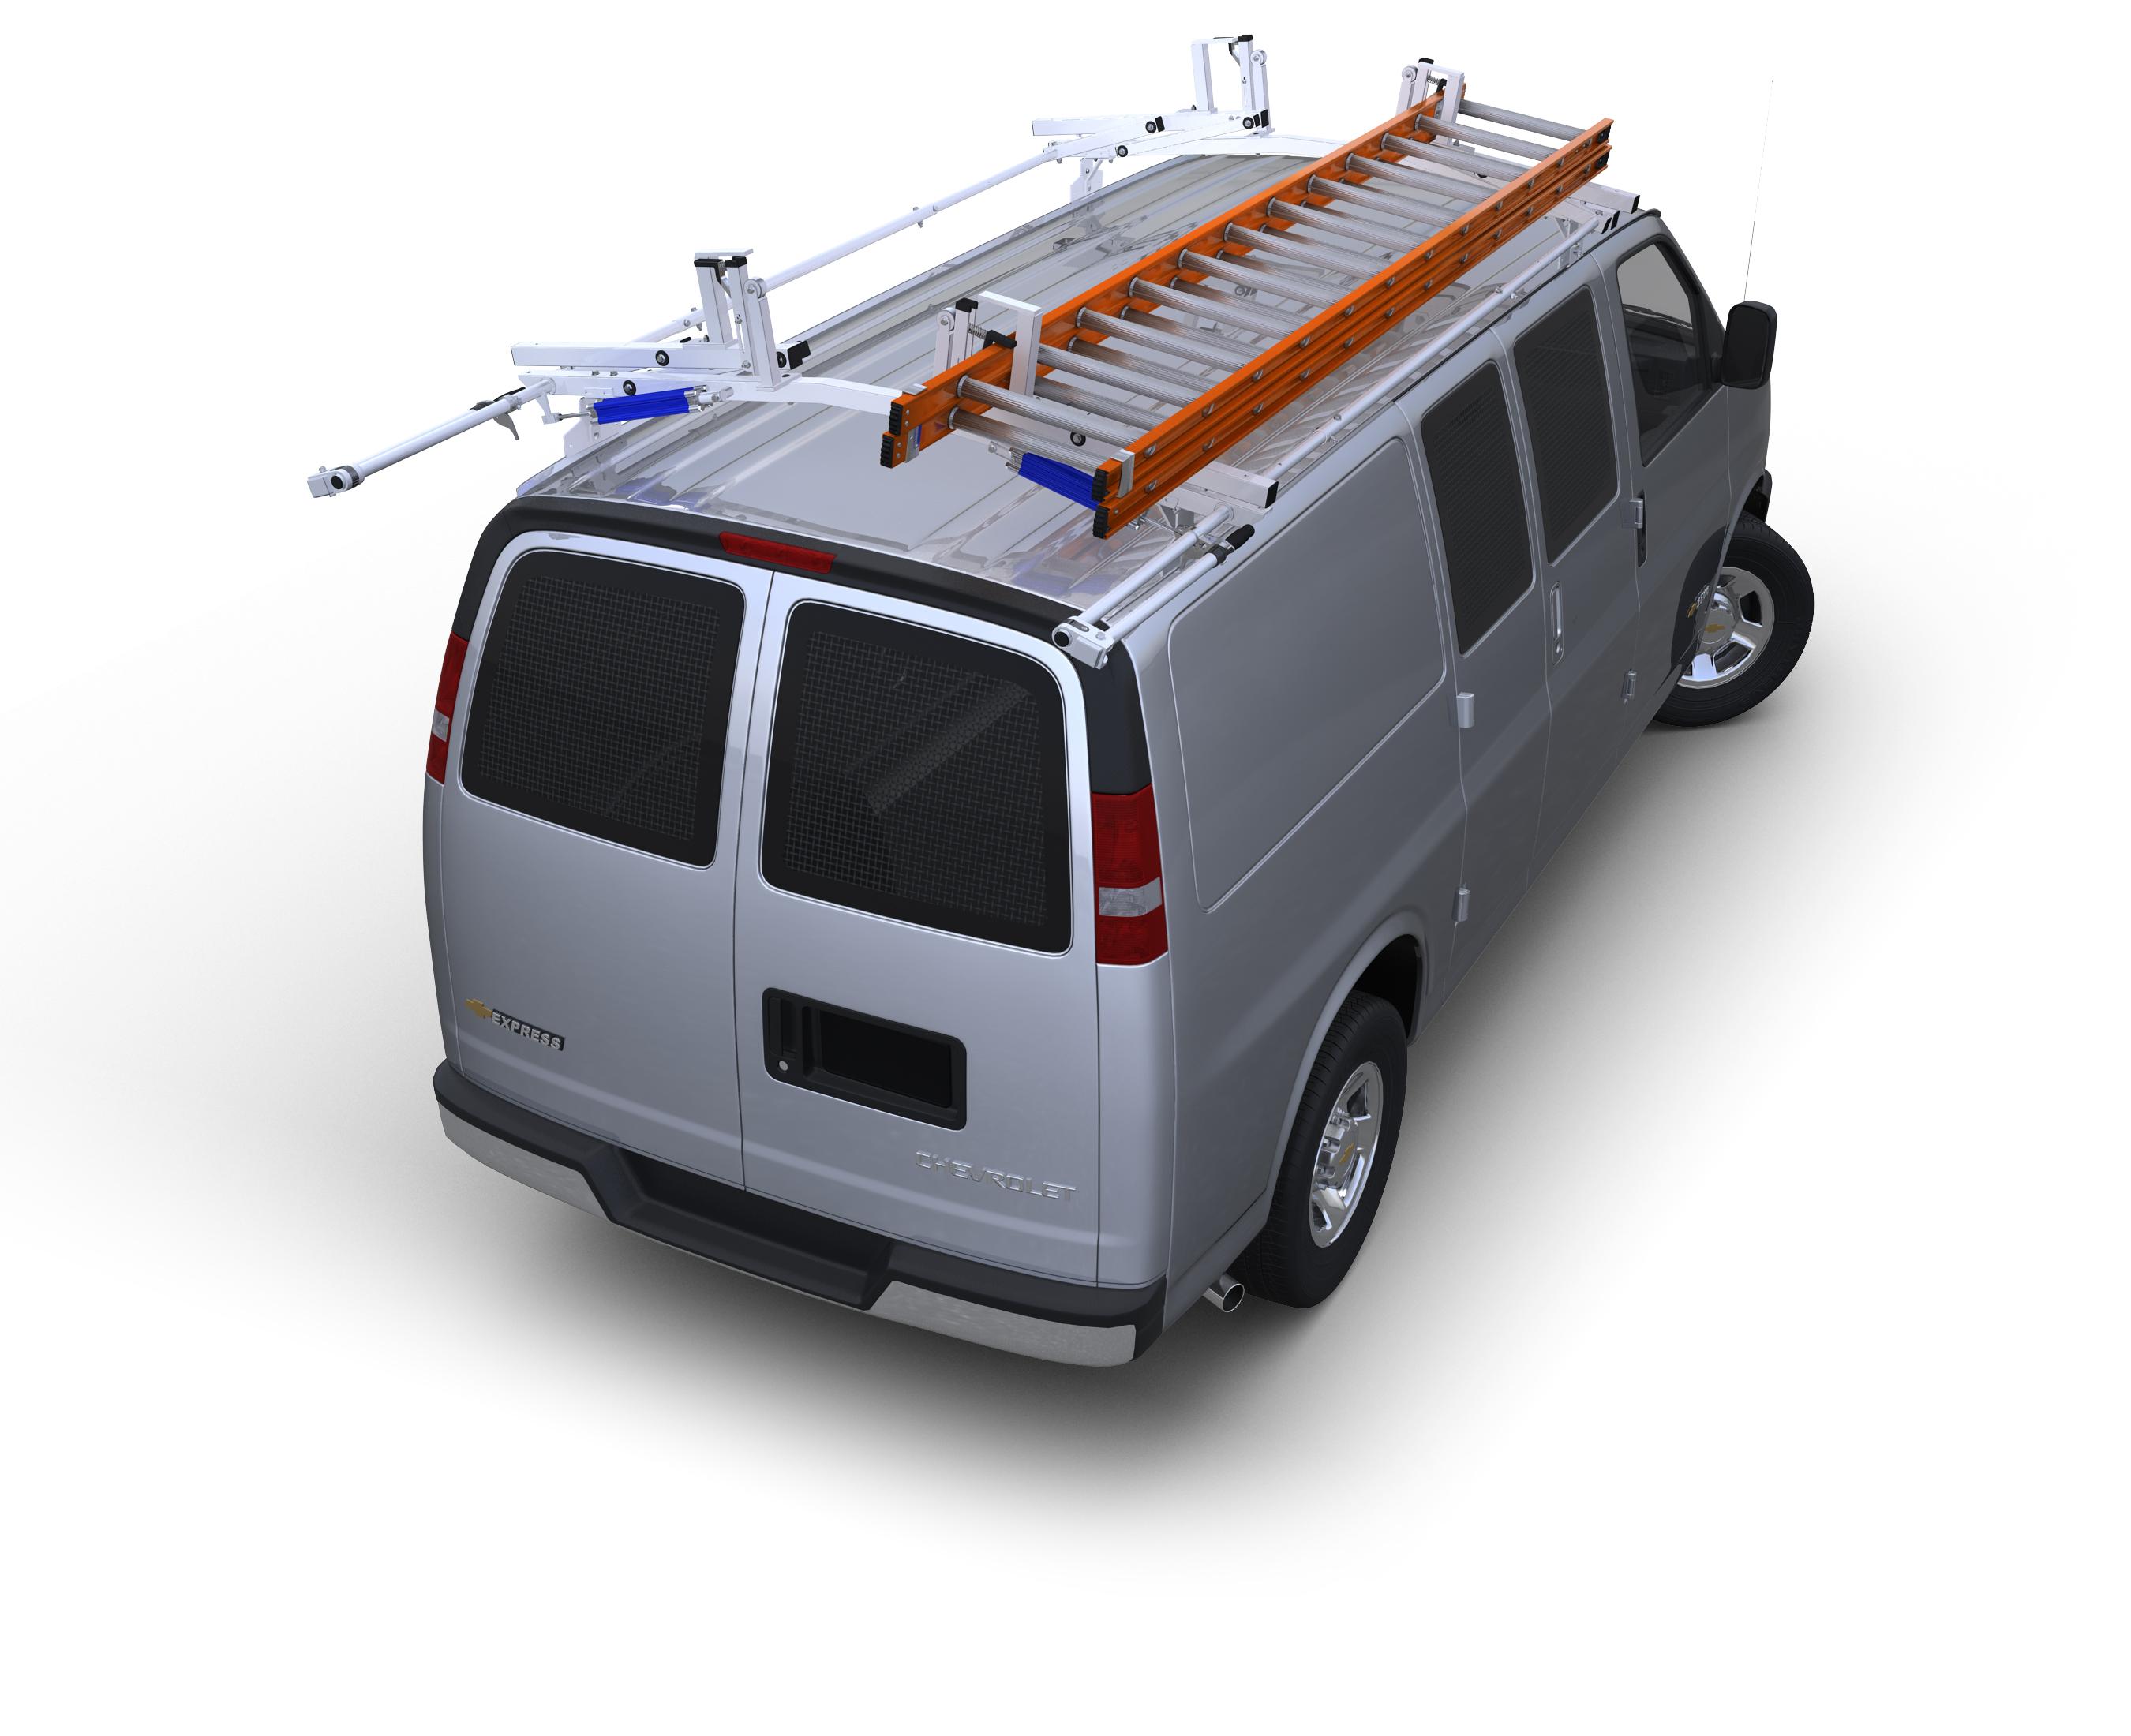 2014 & Newer Transit Connect Long WB HVAC Van Package, Aluminum Shelving - SAVE $100!